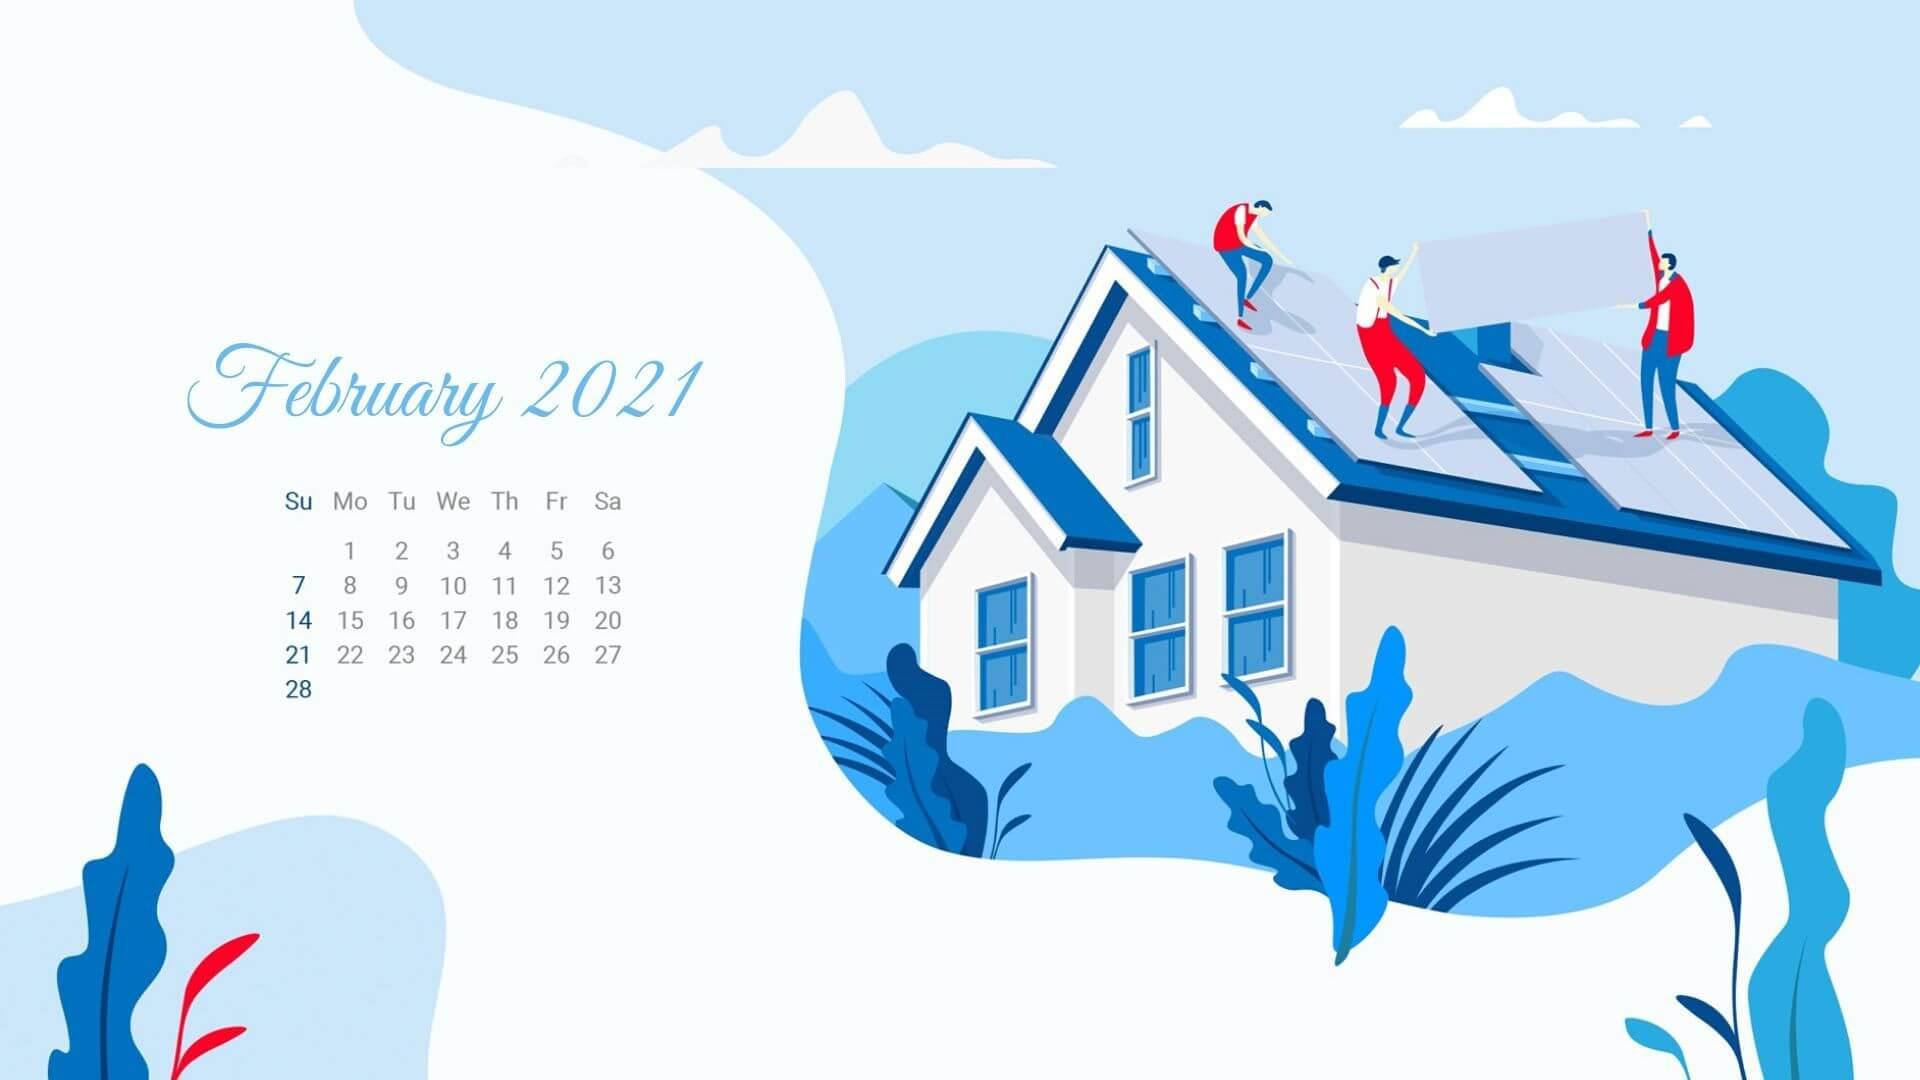 February 2021 HD Calendar Wallpaper